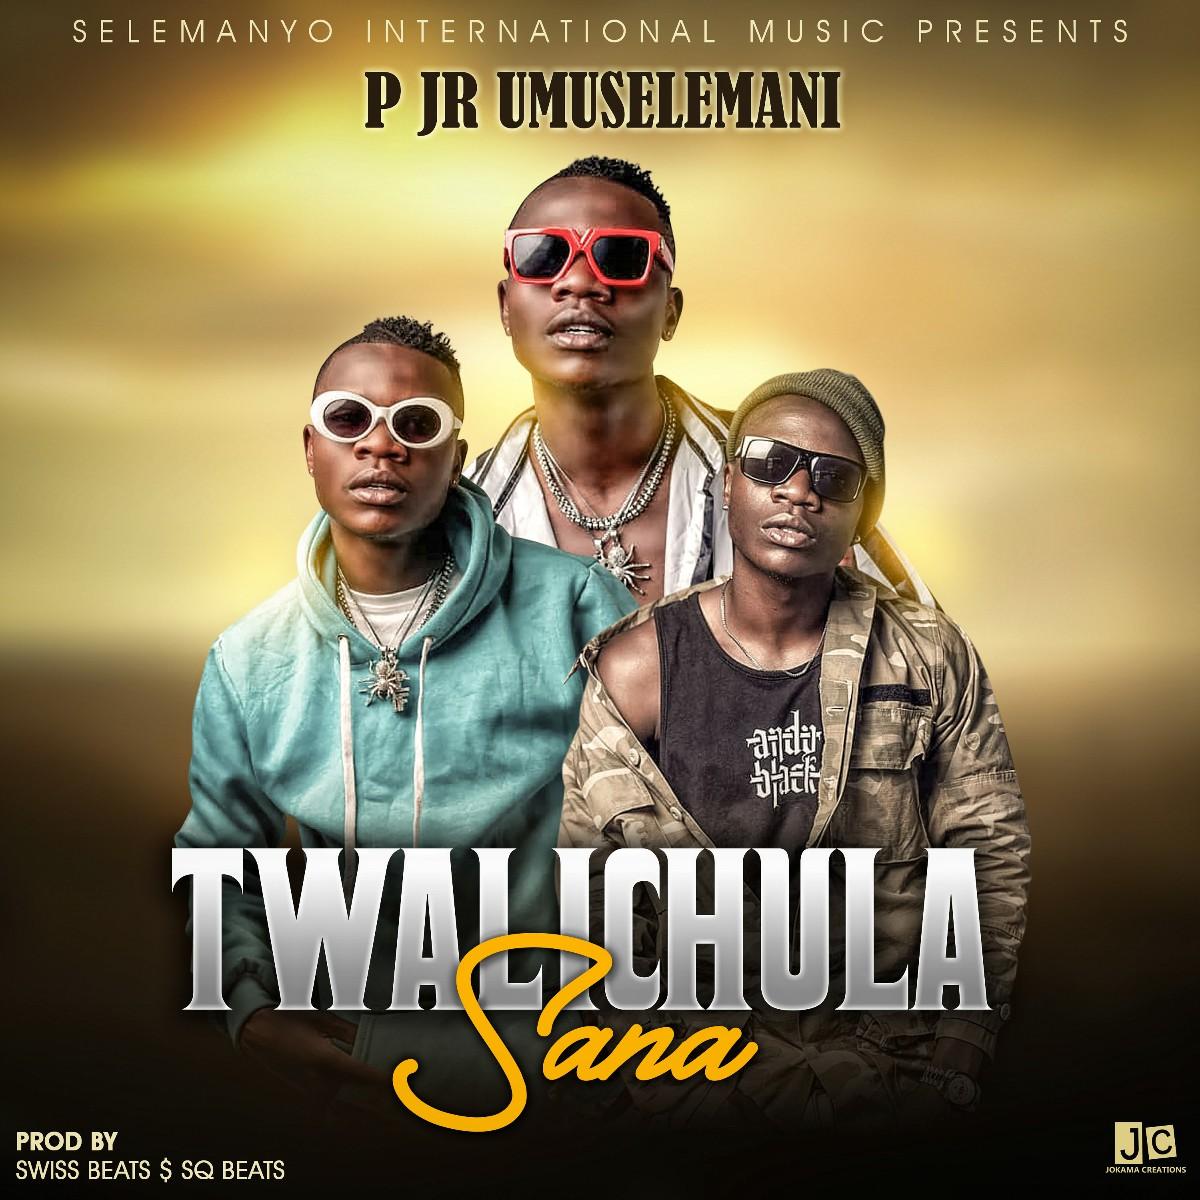 P Jr. Umuselemani - Twalichula Sana